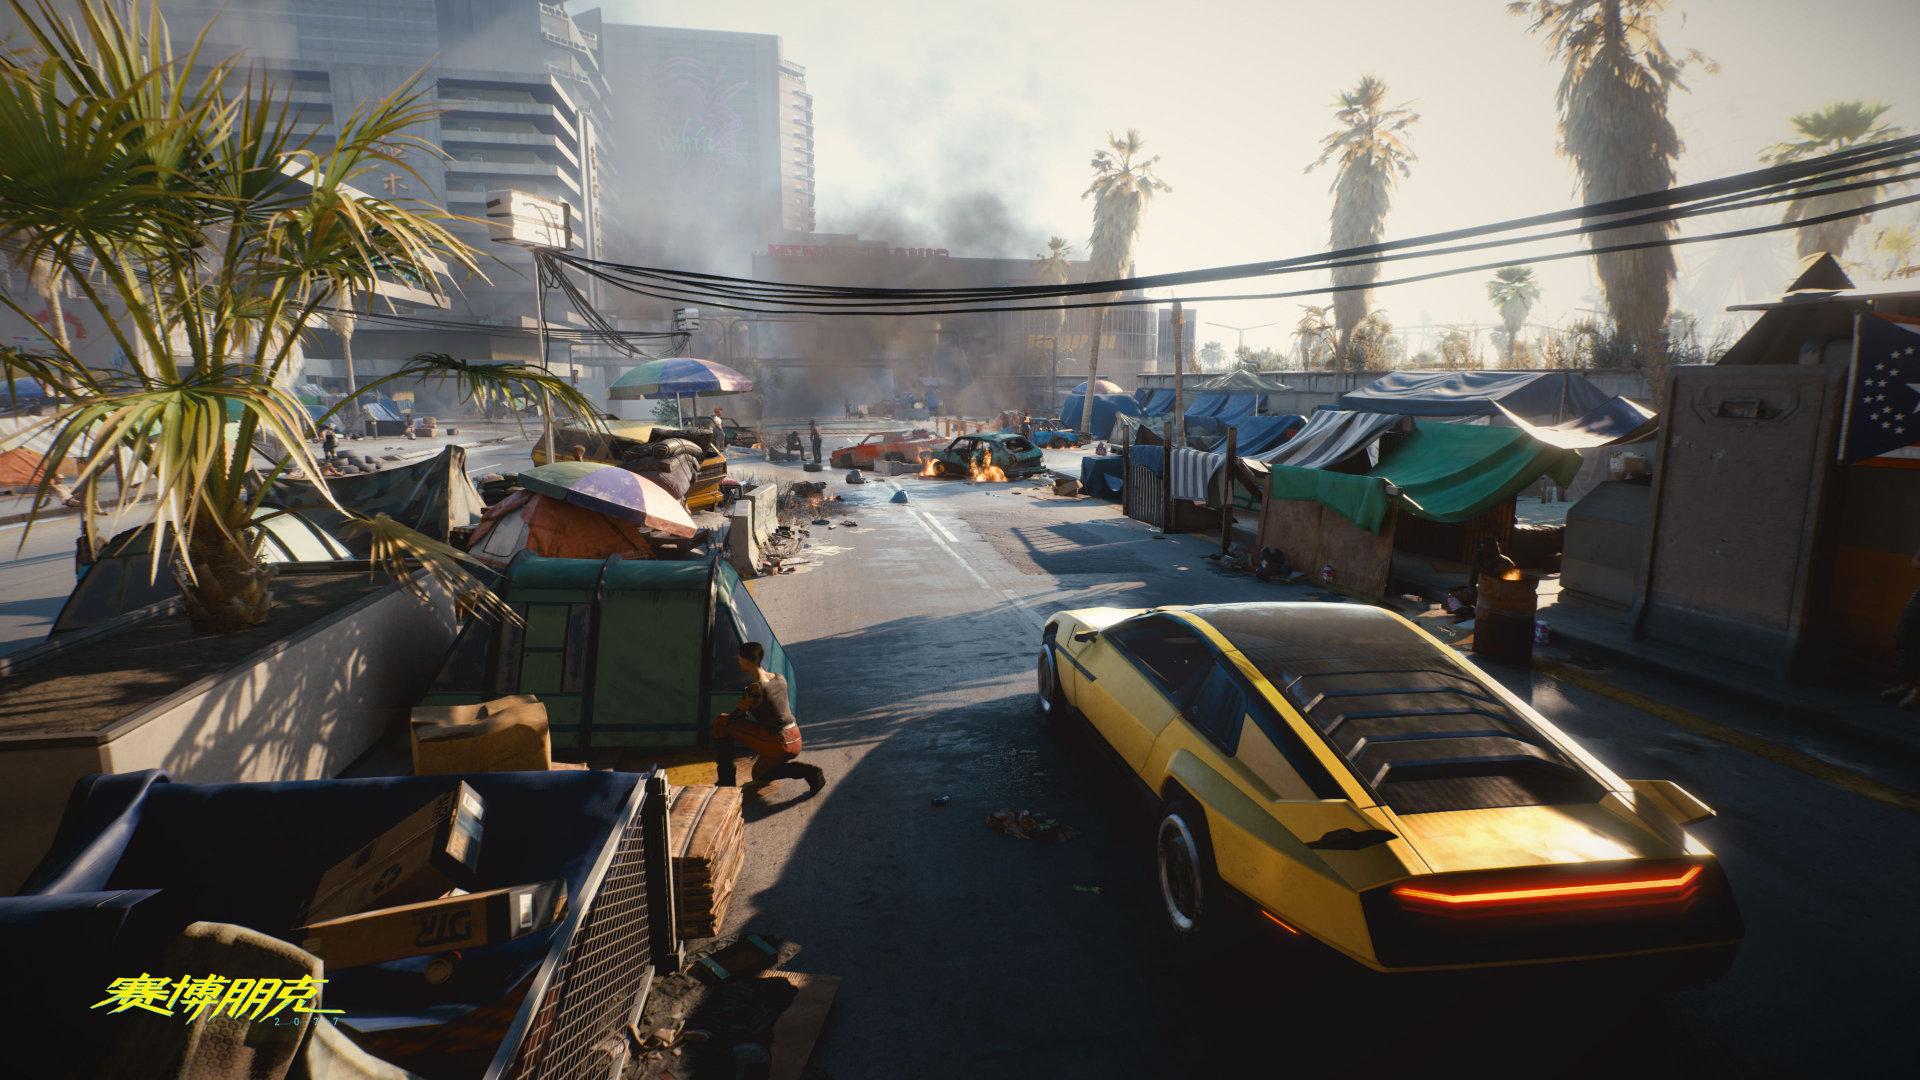 GC 2019:CDPR官方发布《赛博朋克2077》高清游戏截图 铃木裕现身展台